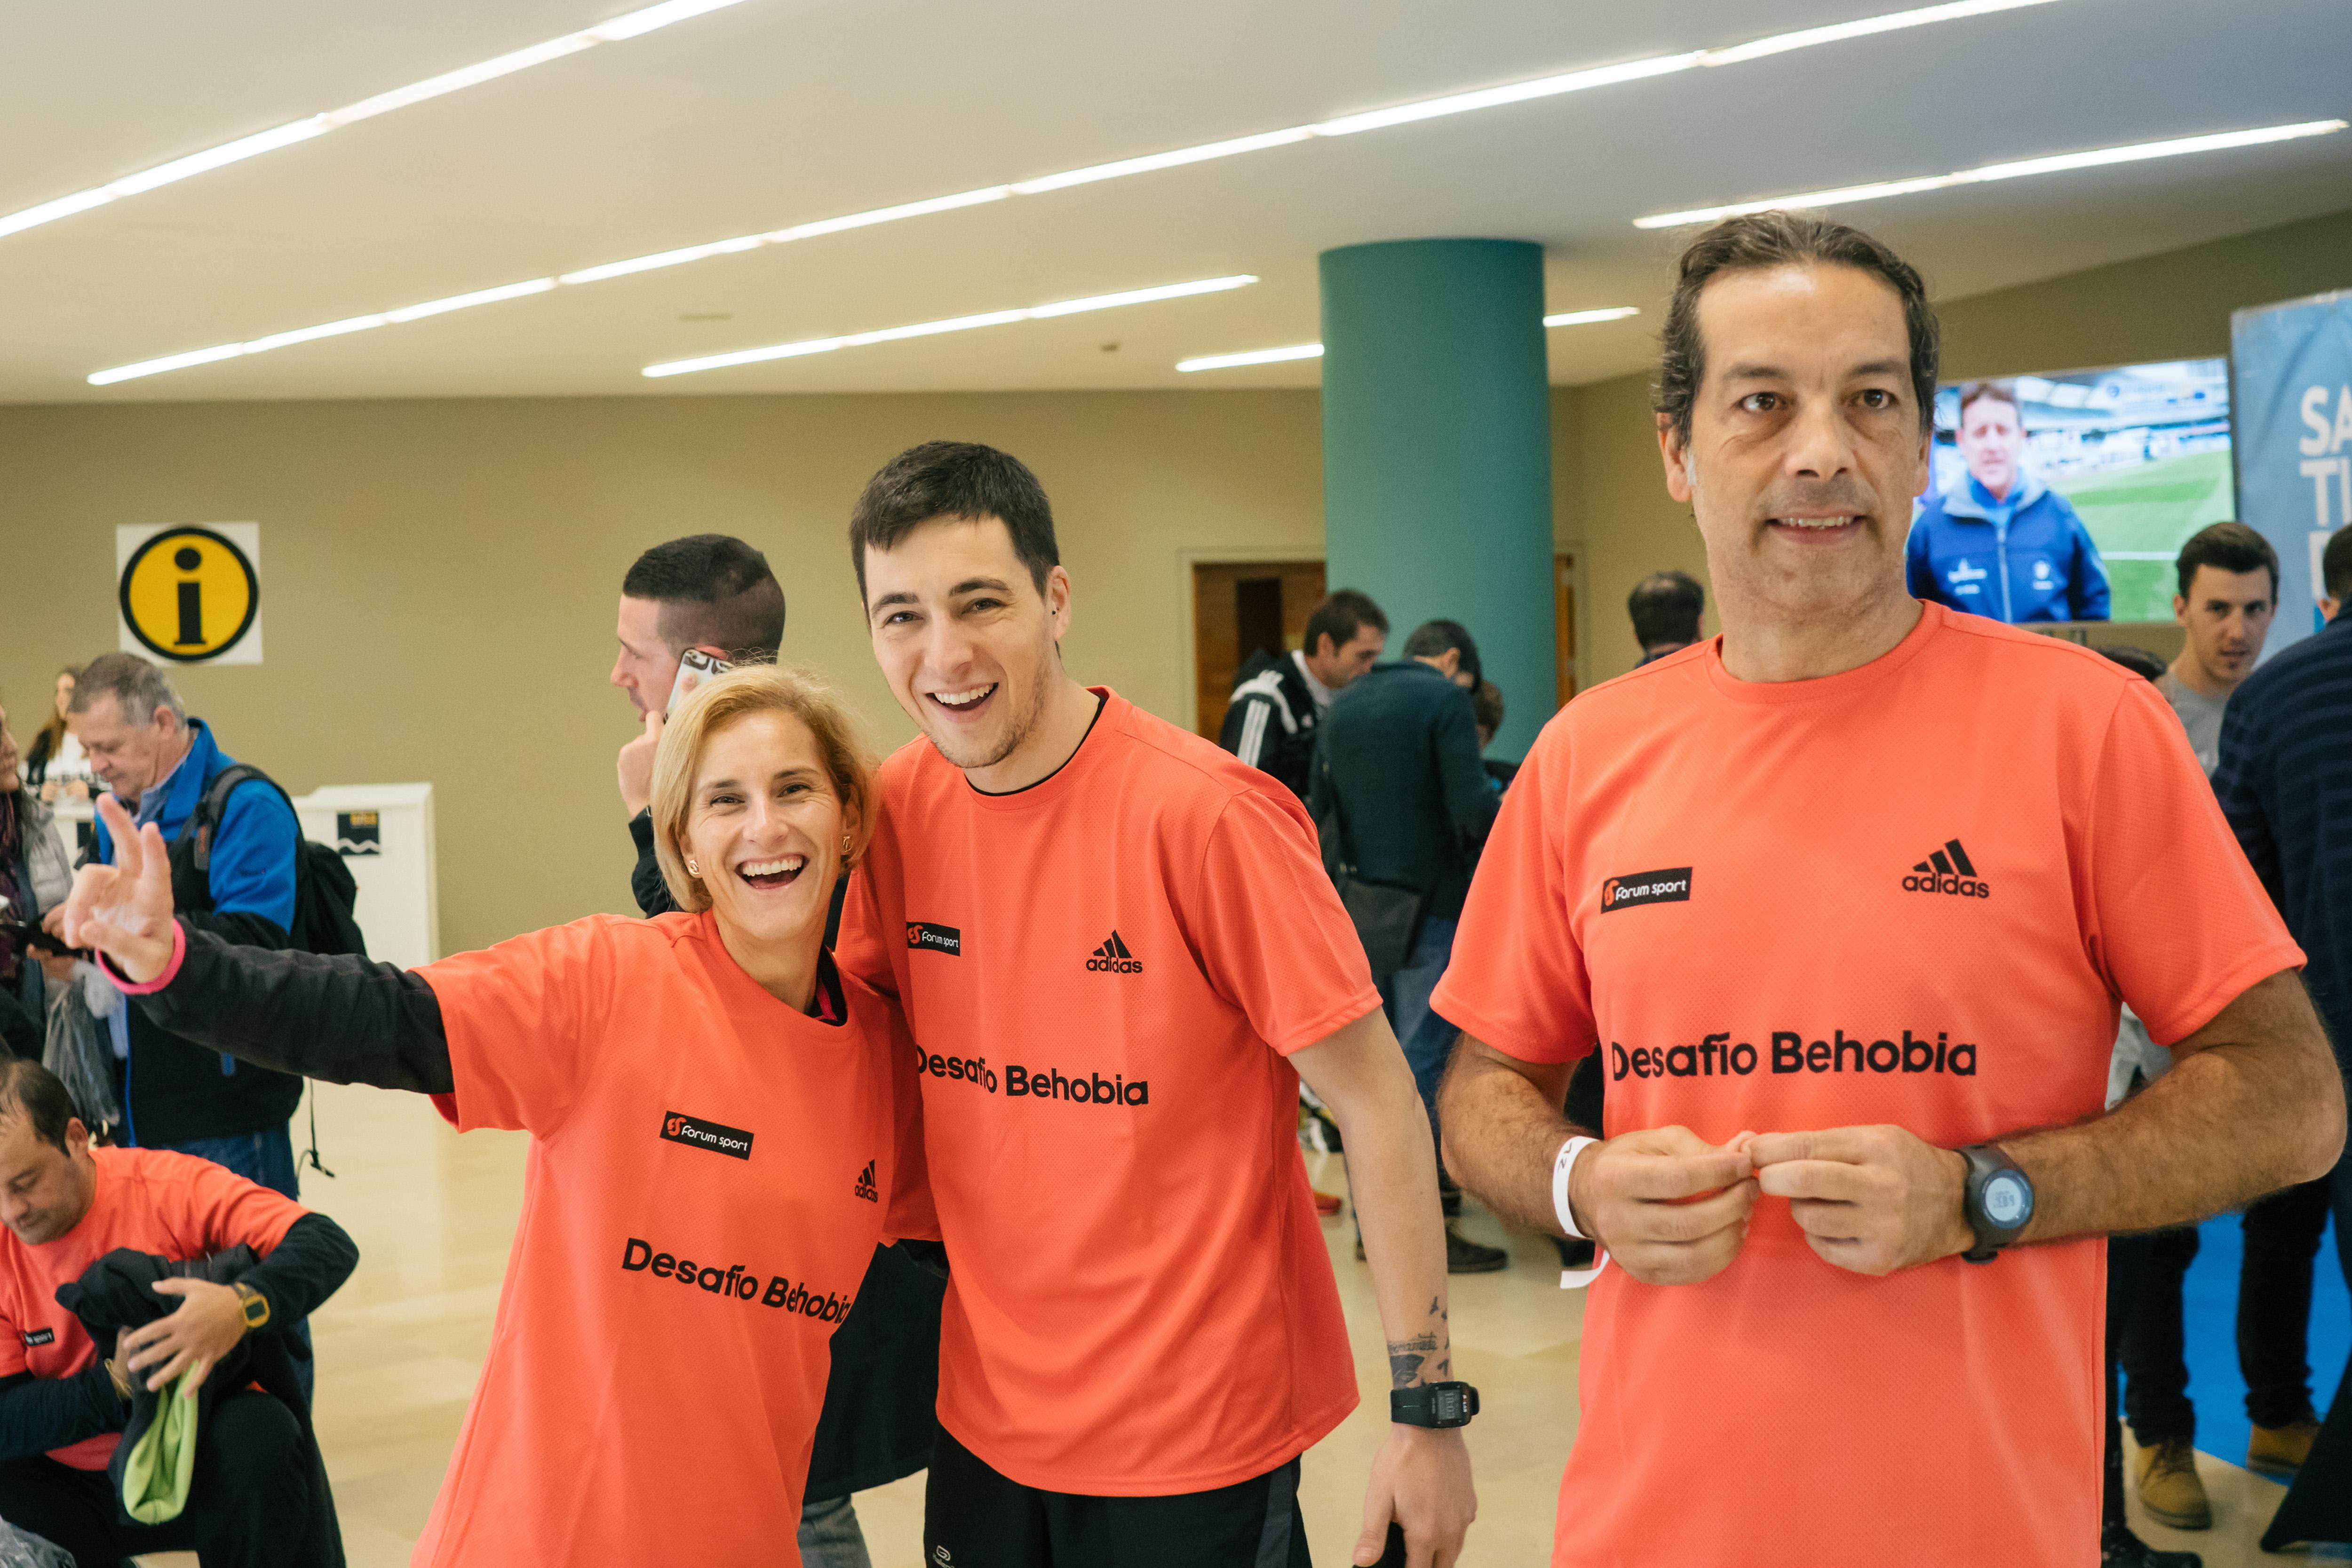 Behobia-San Sebastián, Desafío 3: Chema Martinez, Vanessa Veiga y Carles Castillejo, Take Charge Behobia-SS